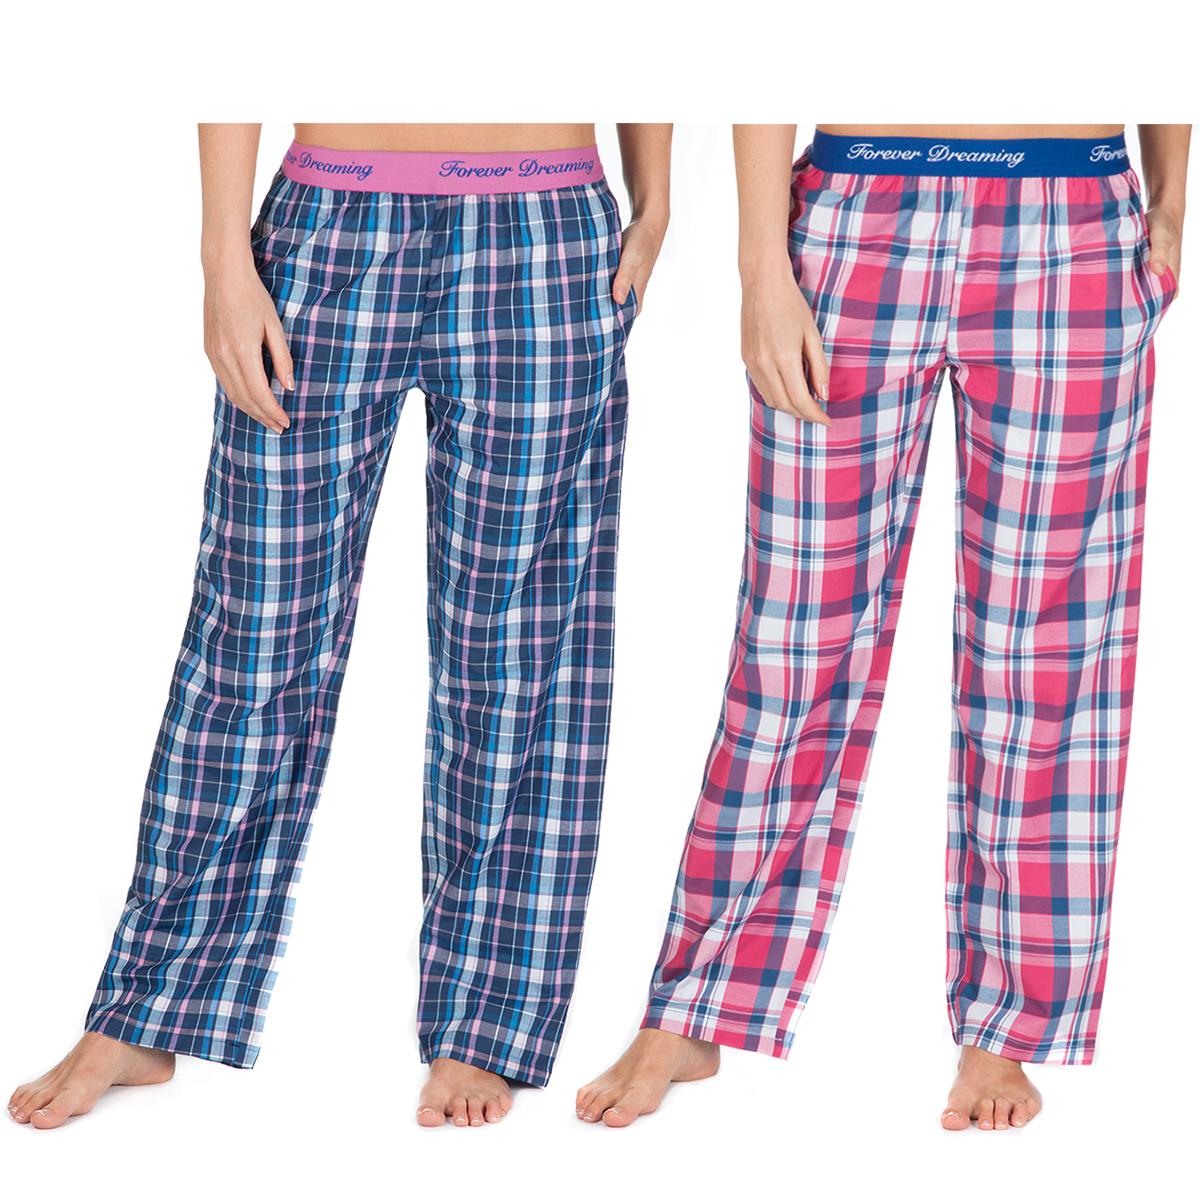 8323a43bb Women s Ladies Lounge Pants Pyjama Bottoms Check PJs Night Trousers Jacquard